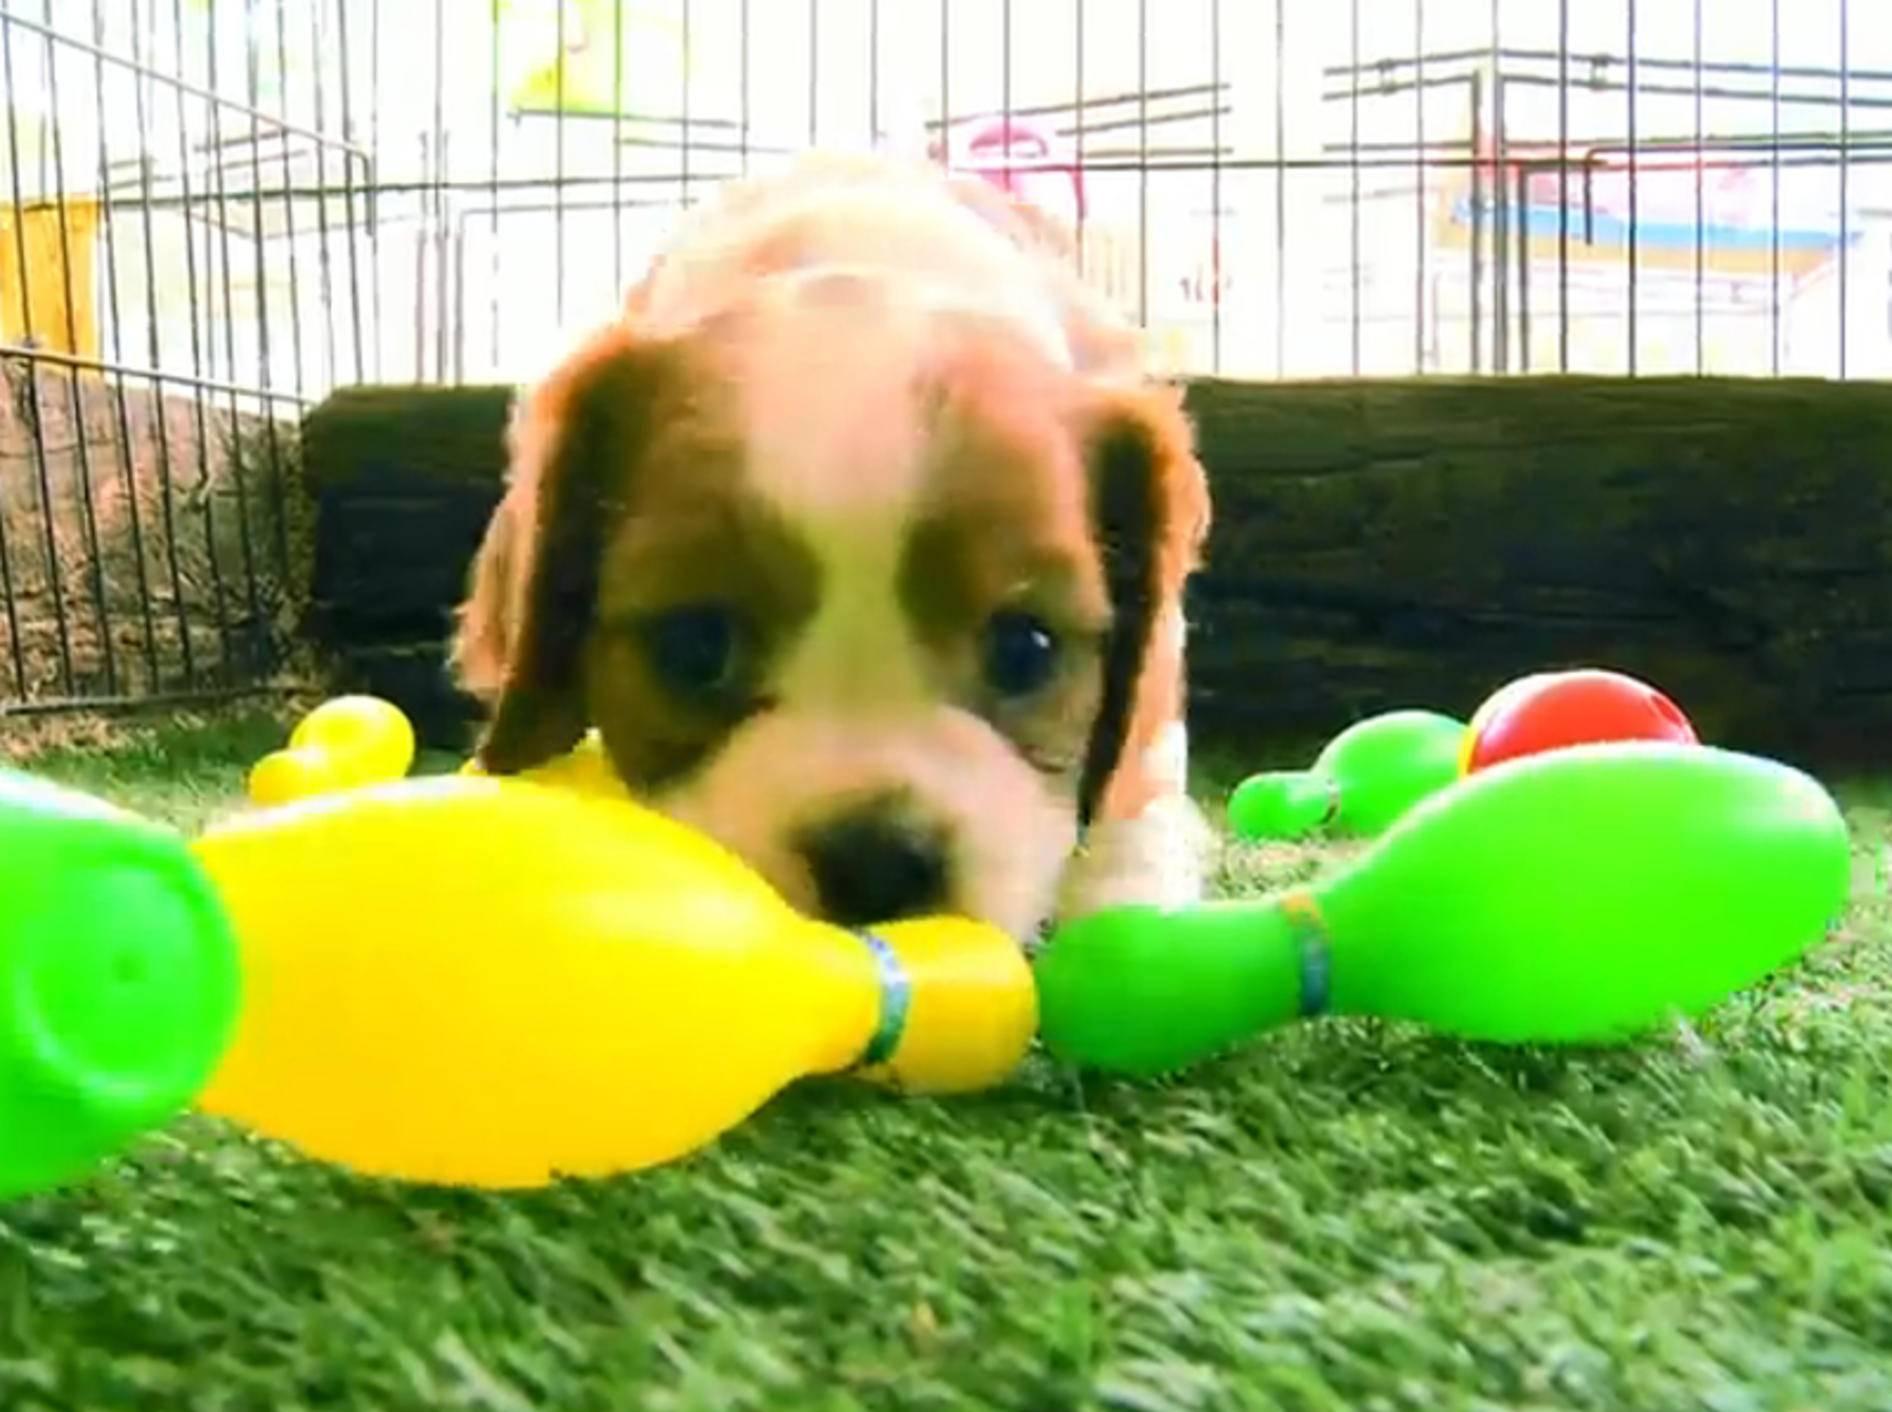 Hundewelpen spielen mit Plastikkegeln – Bild: YouTube / The Pet Collective